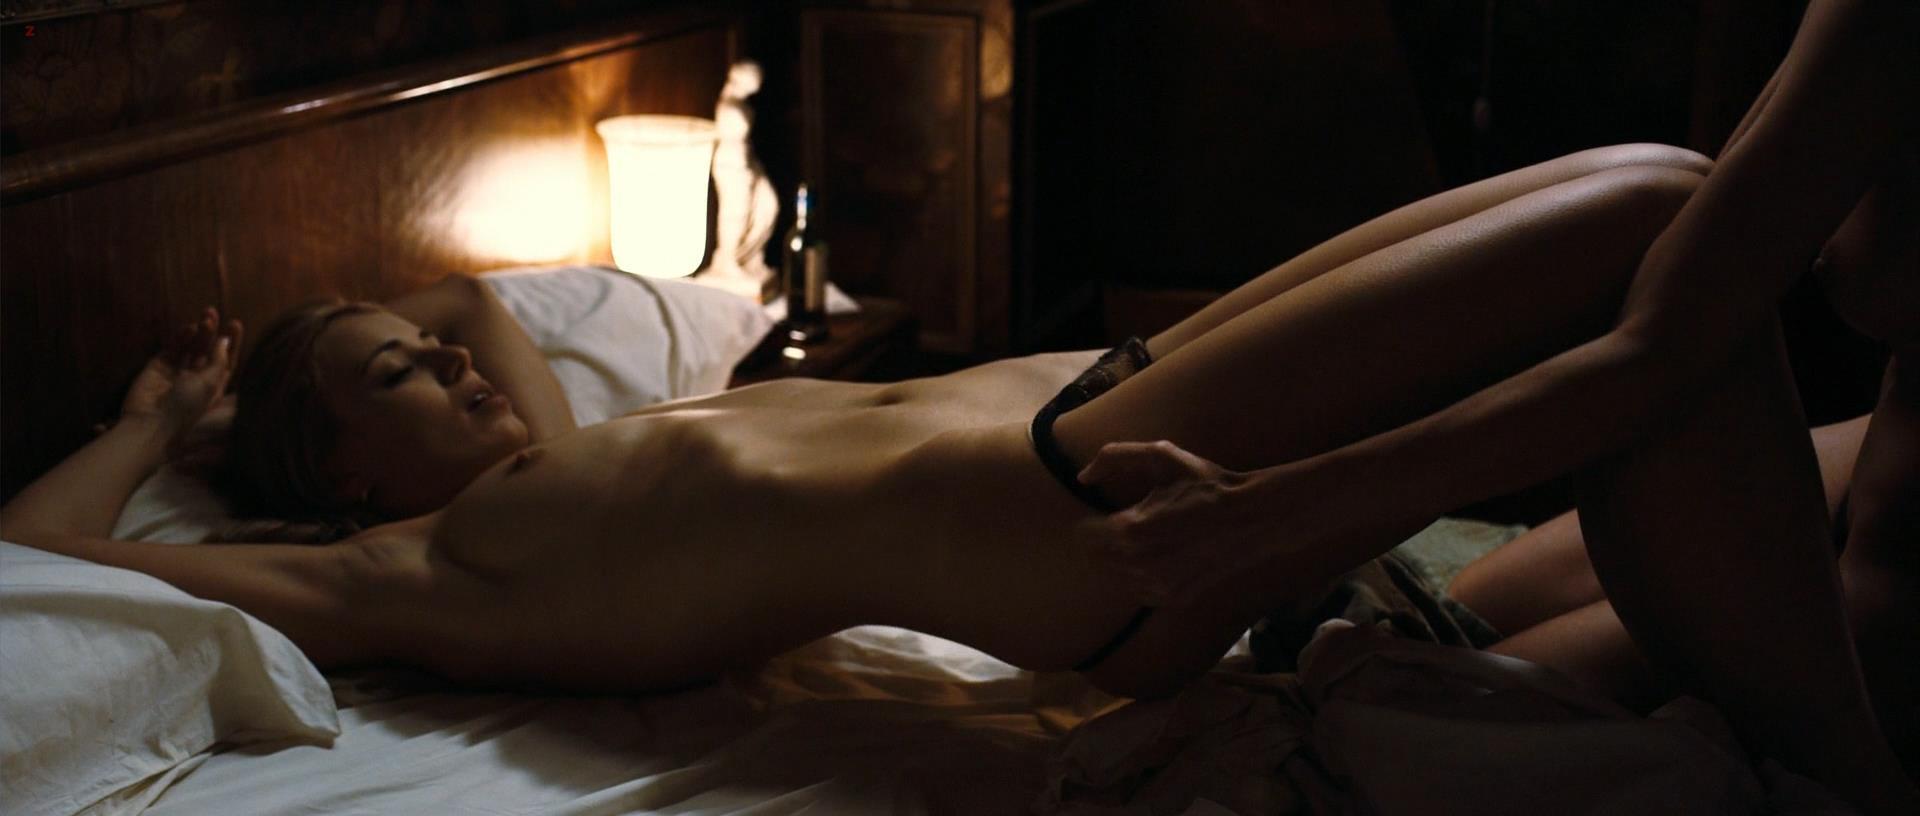 Me, please rome room elena anaya nude the intelligible